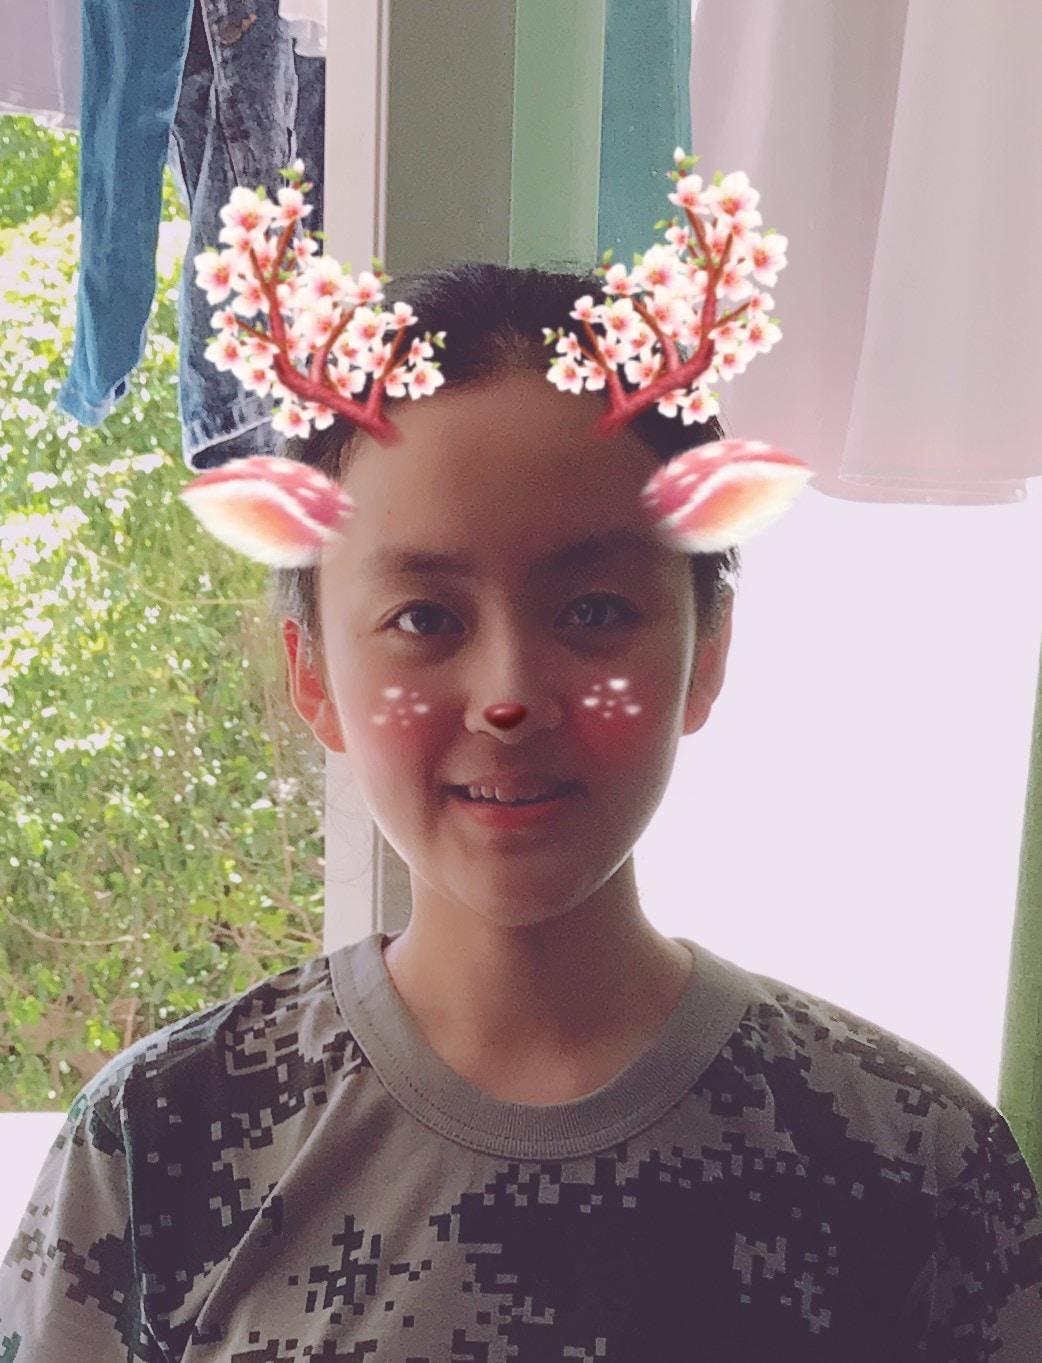 Go to zhang yuxuan's profile